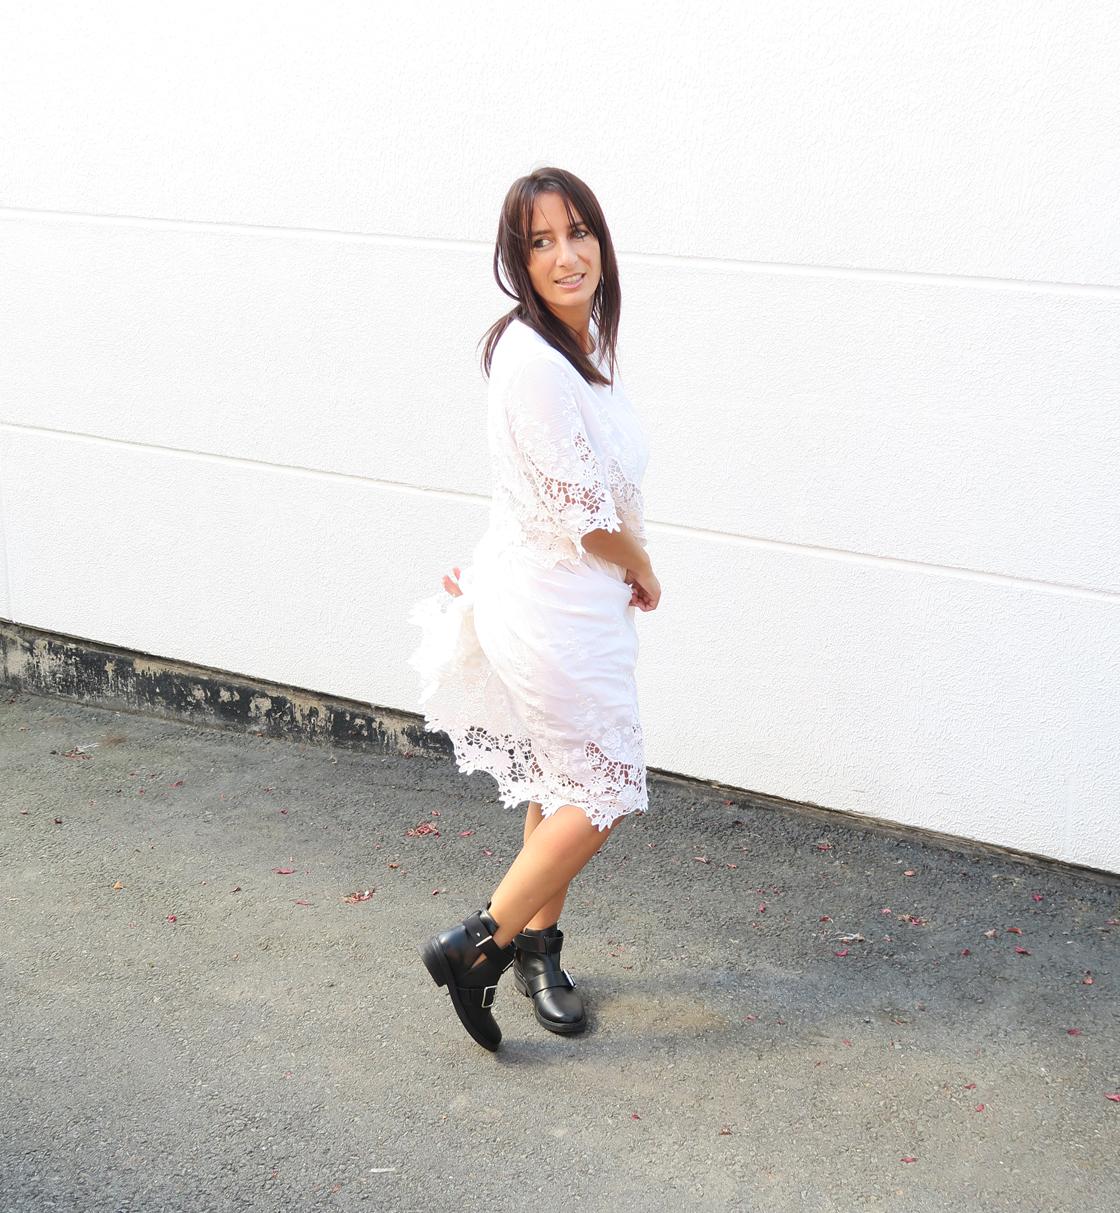 blogger-edited-style-look-bloggerstyle-spitzenkleid-dress-kleid-boots-bikerboots-3